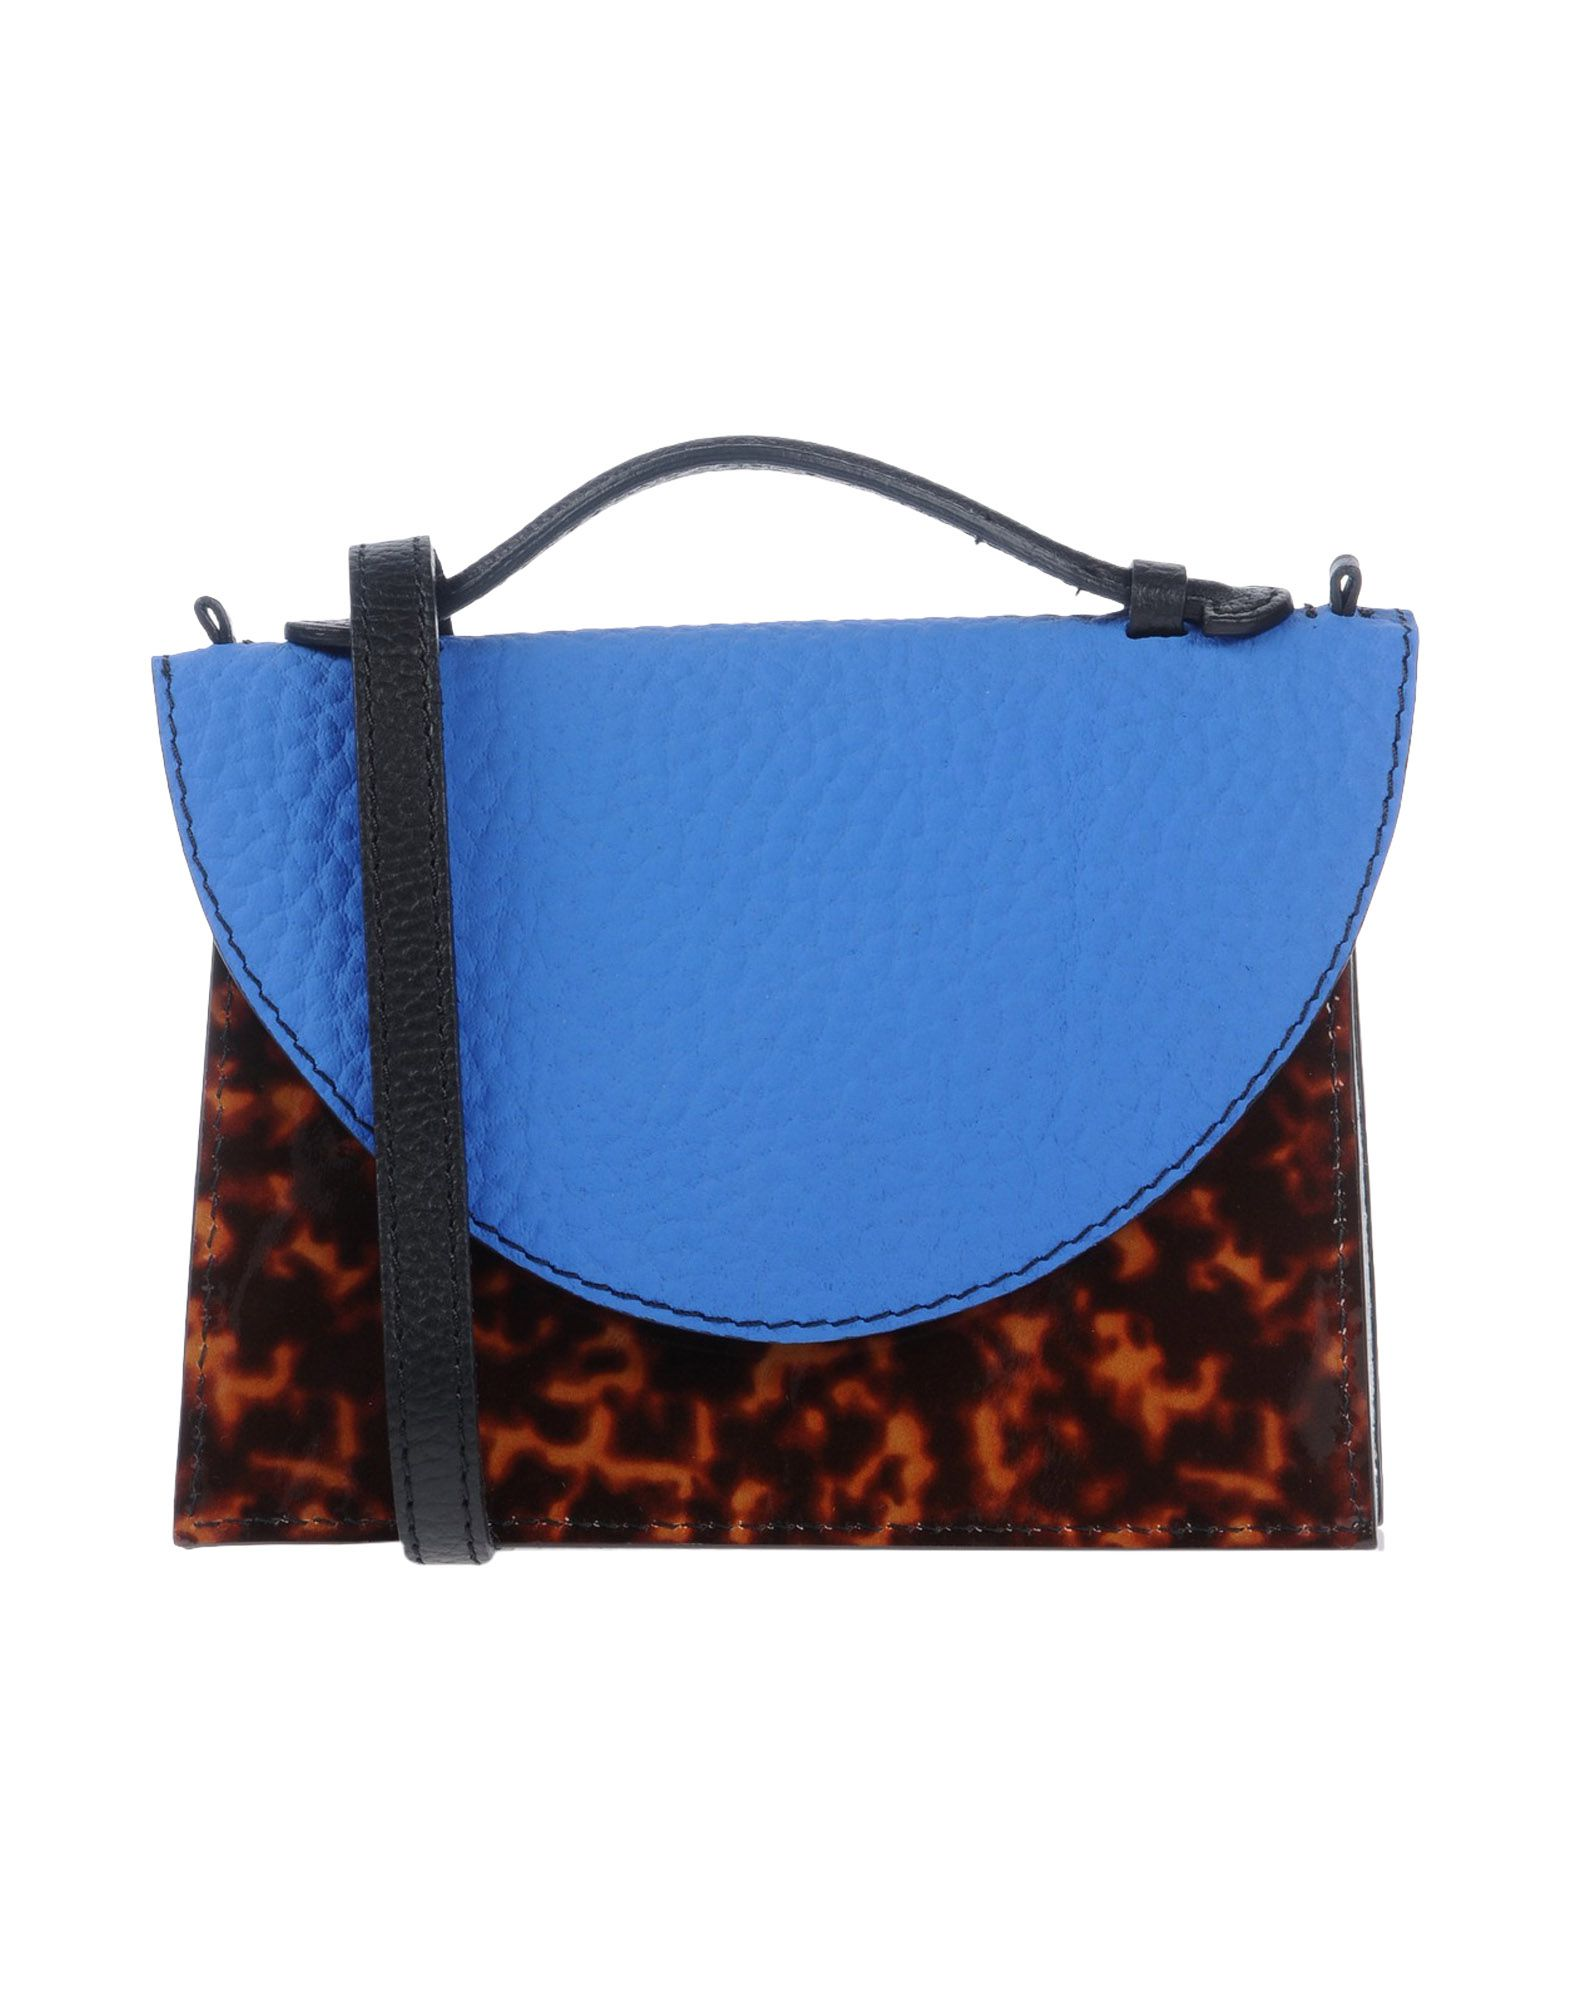 IMEMOI Handbag in Azure